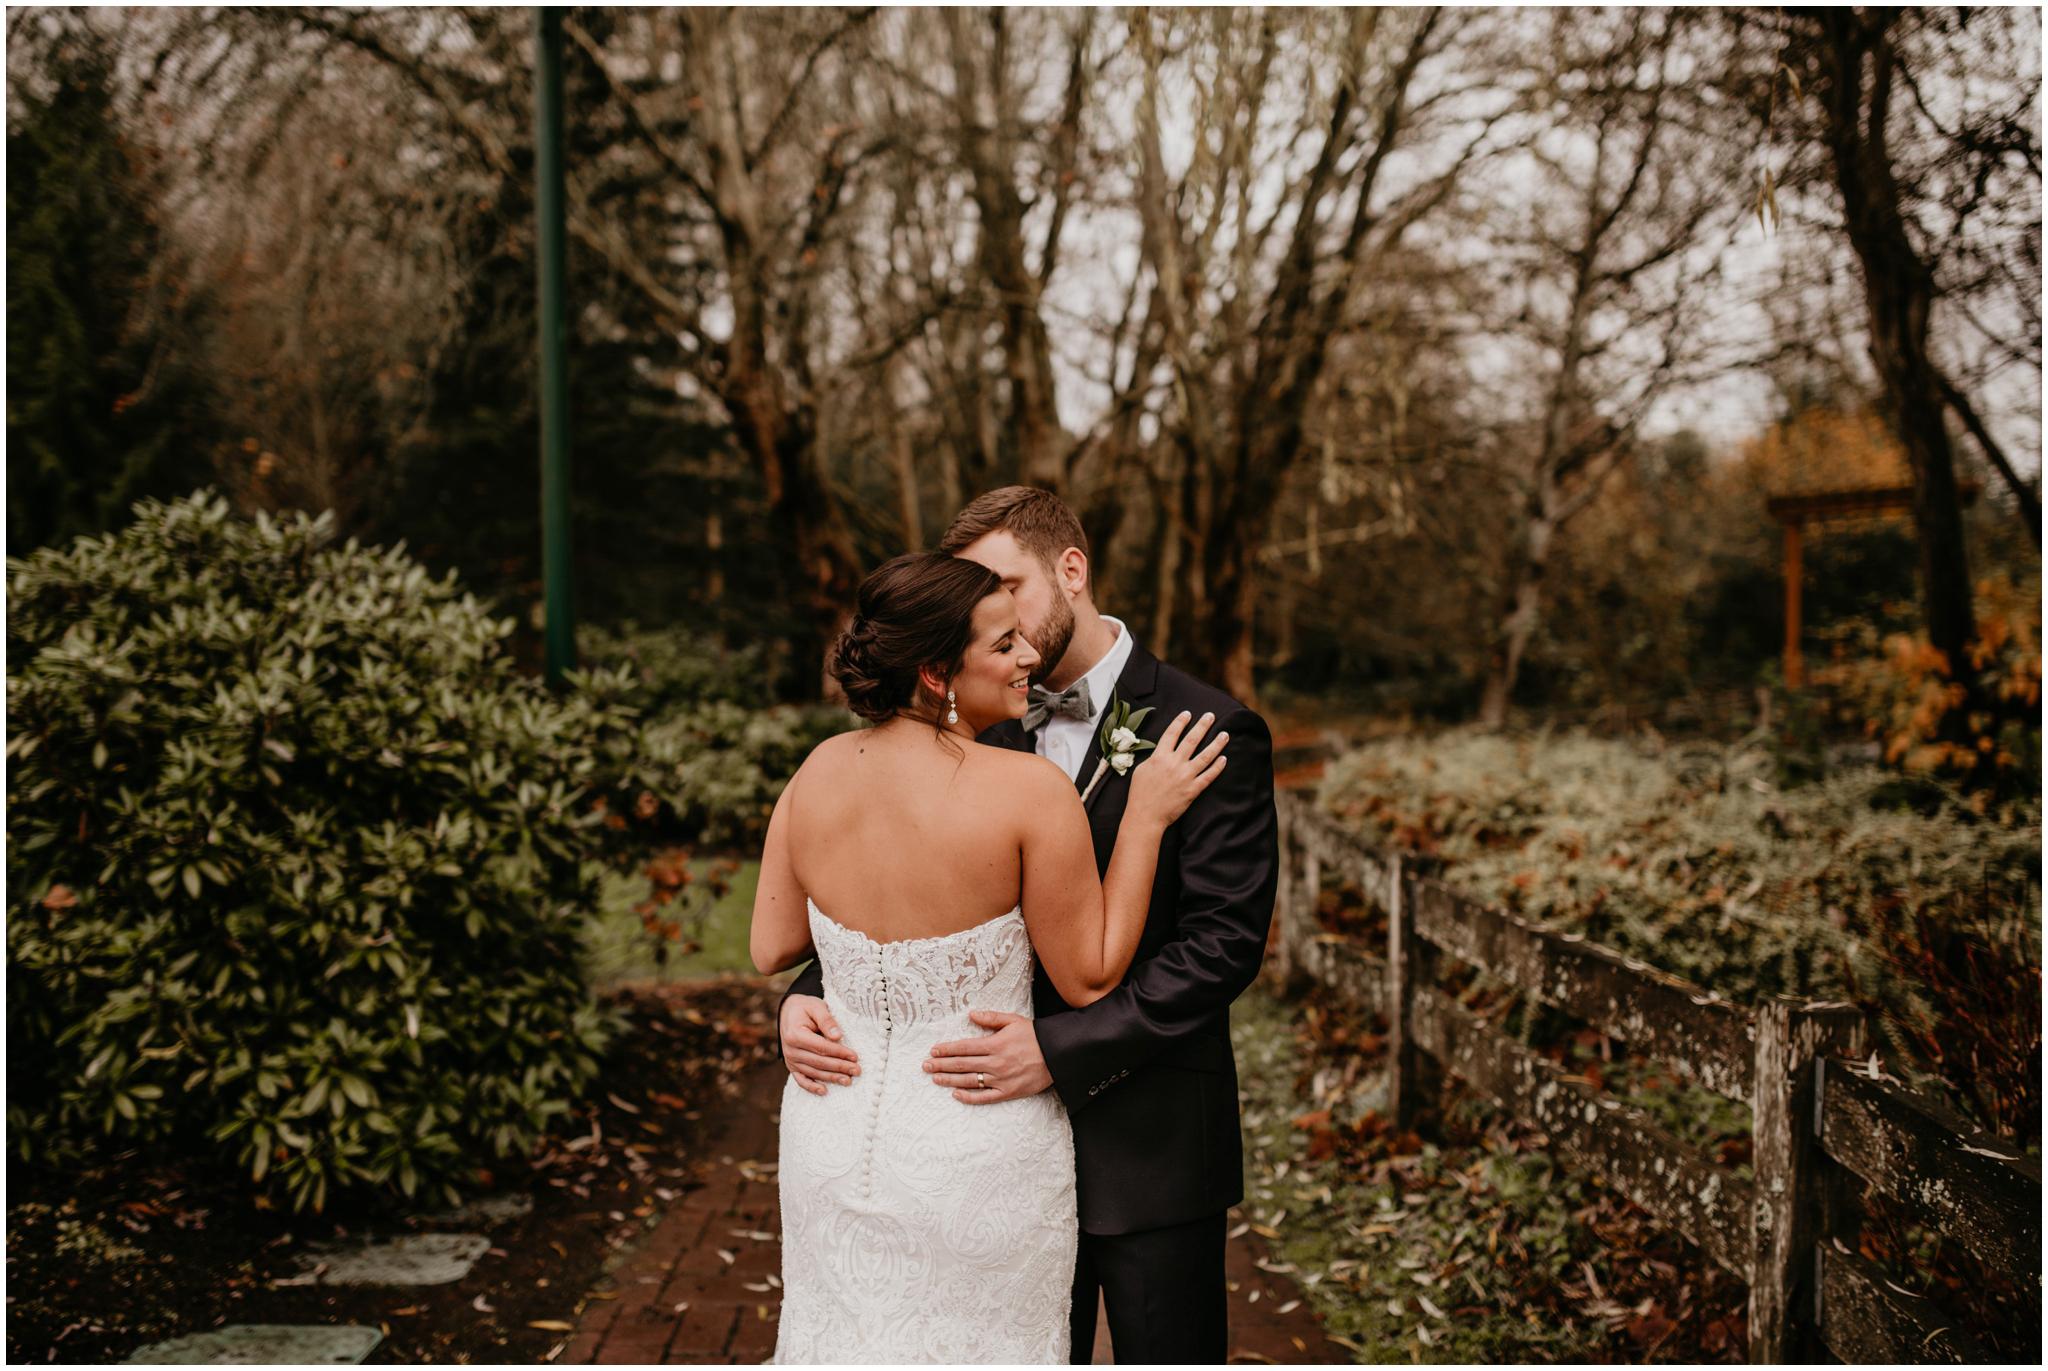 ashley-tj-the-pickering-barn-winter-wedding-seattle-photographer-028.jpg